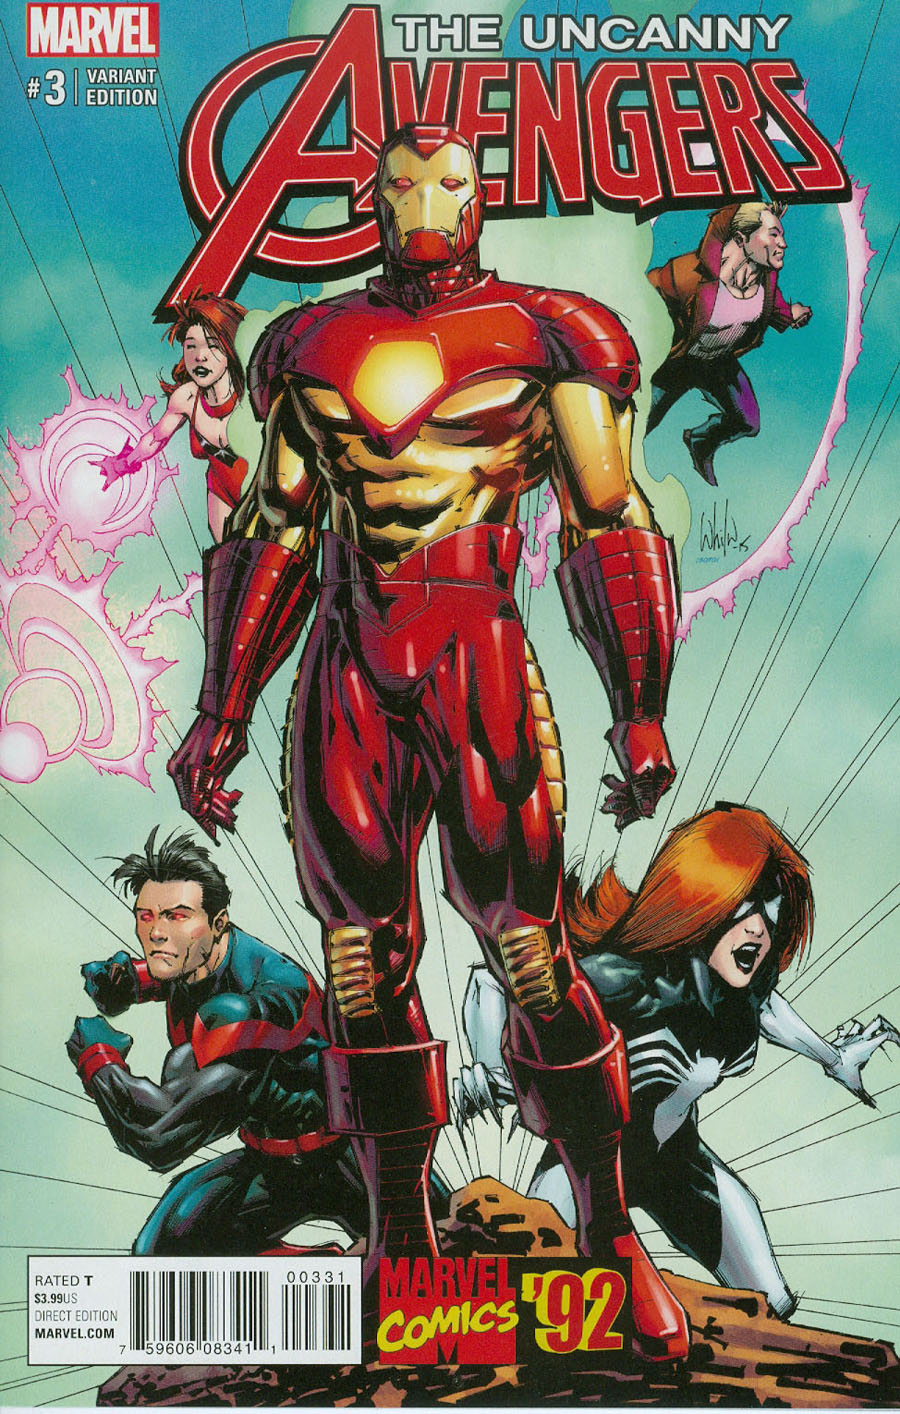 Uncanny Avengers Vol 3 #3 Cover B Incentive Whilce Portacio Marvel 92 Variant Cover